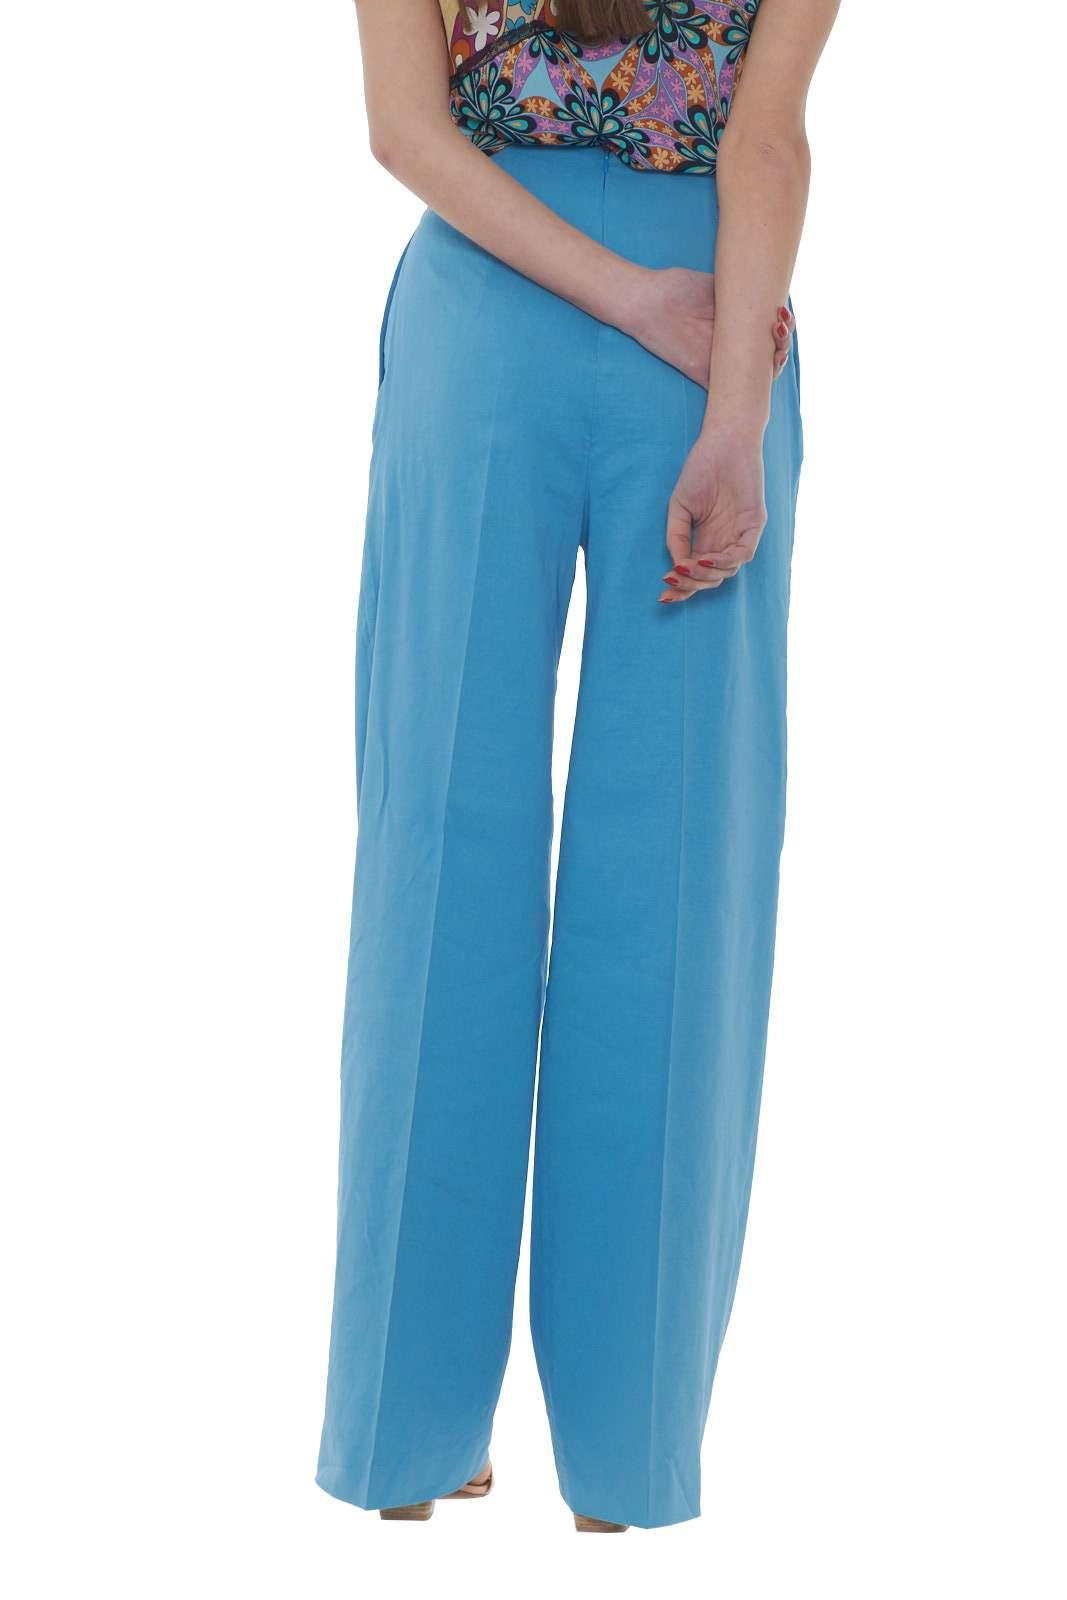 https://www.parmax.com/media/catalog/product/a/i/PE-outlet_parmax-pantaloni-donna-Pinko-1b14f3-D.jpg